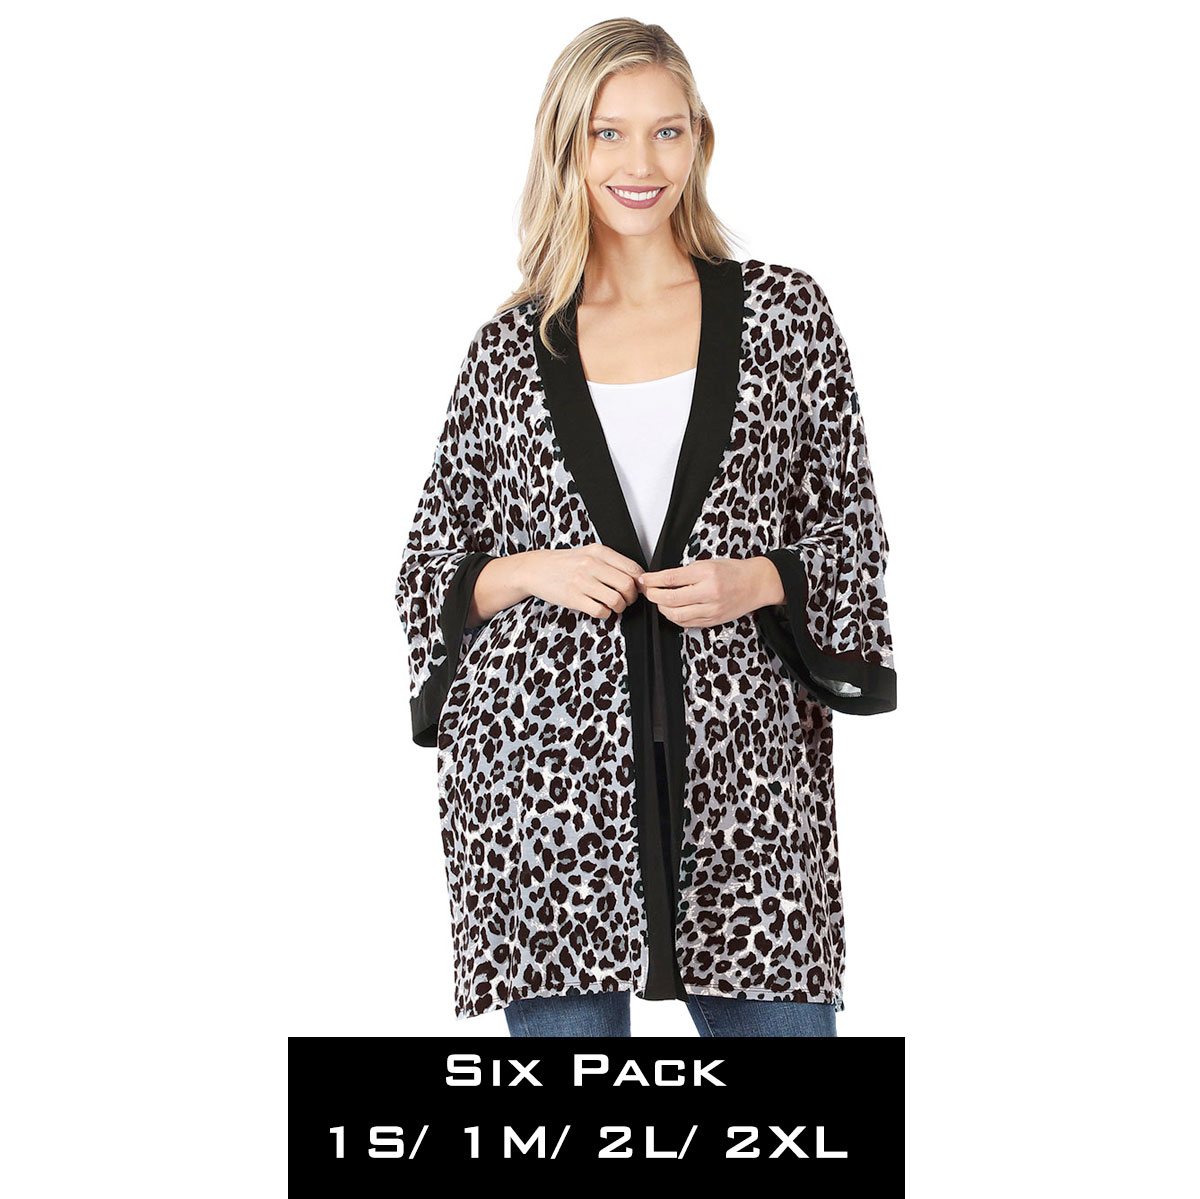 Kimono - Leopard Print 43051